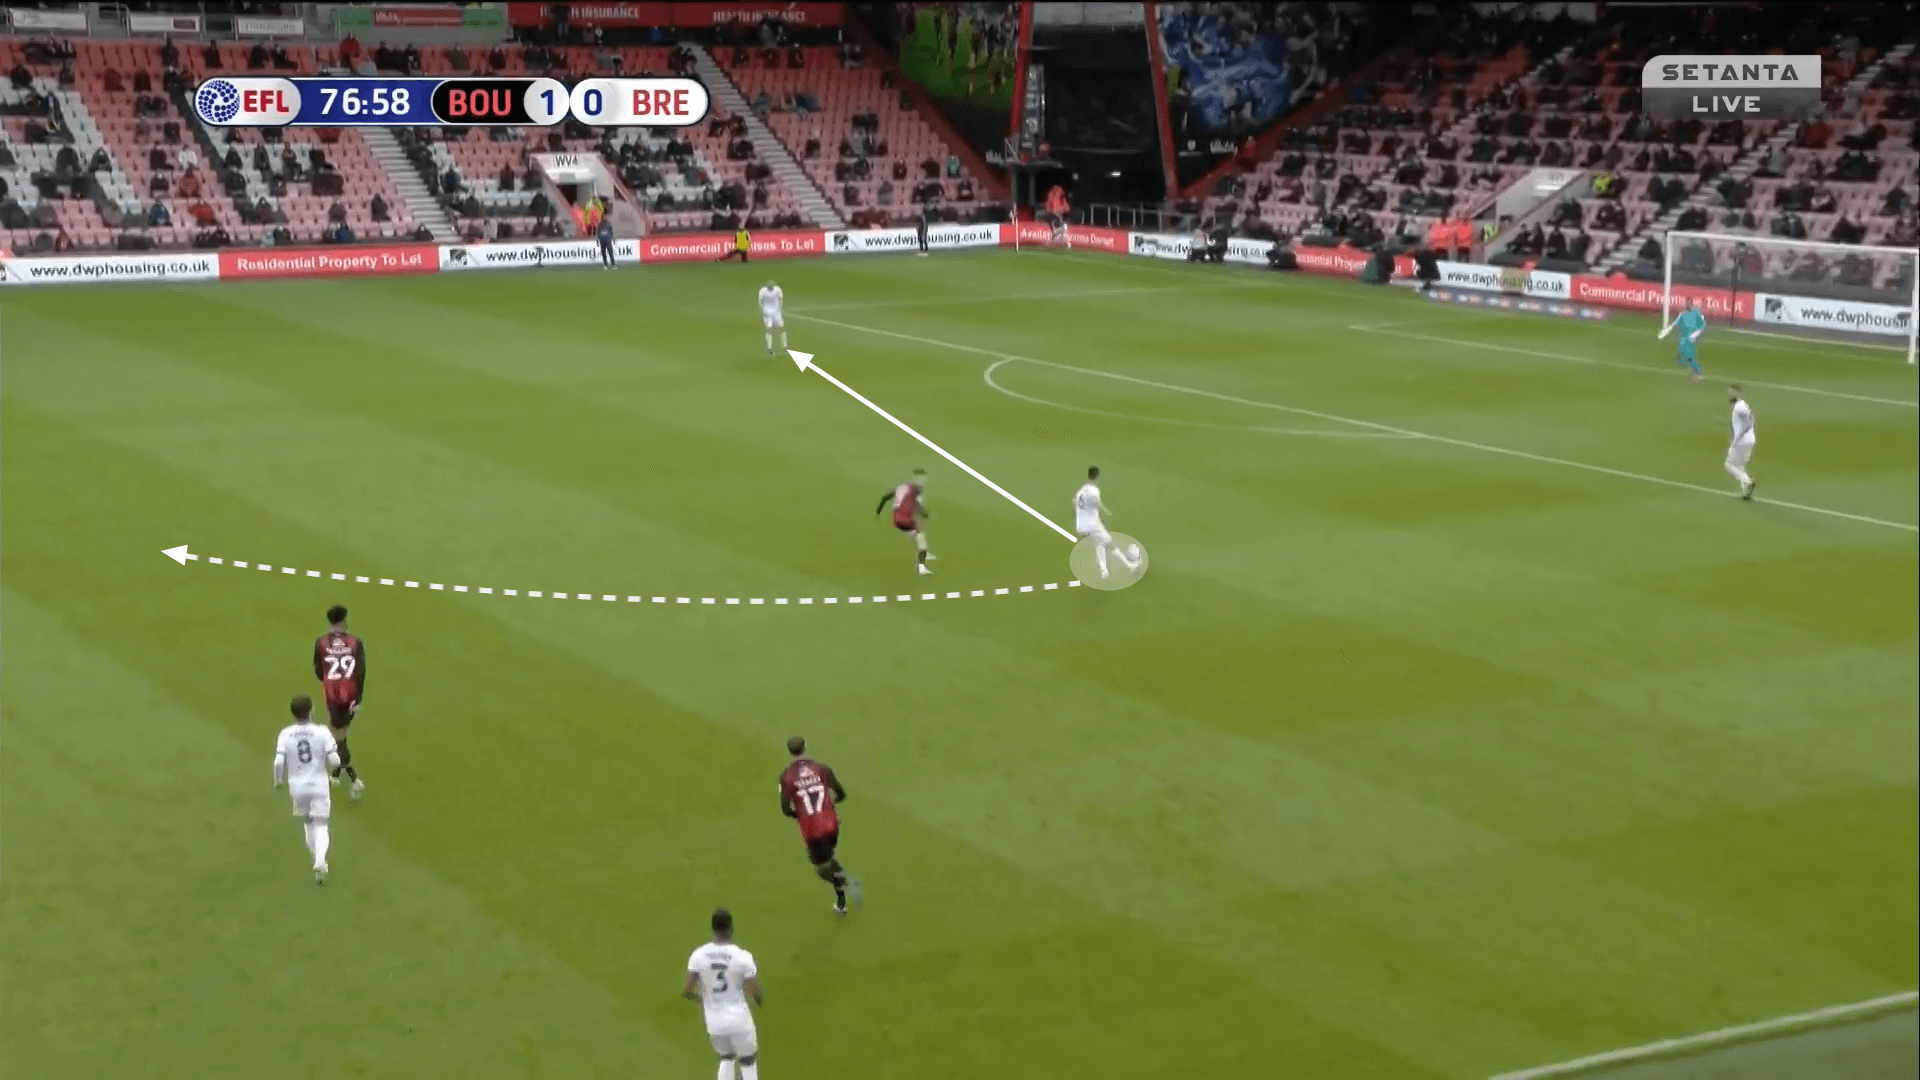 EFL Championship 2020/21: Playoff semi-final 2nd legs - tactical analysis tactics